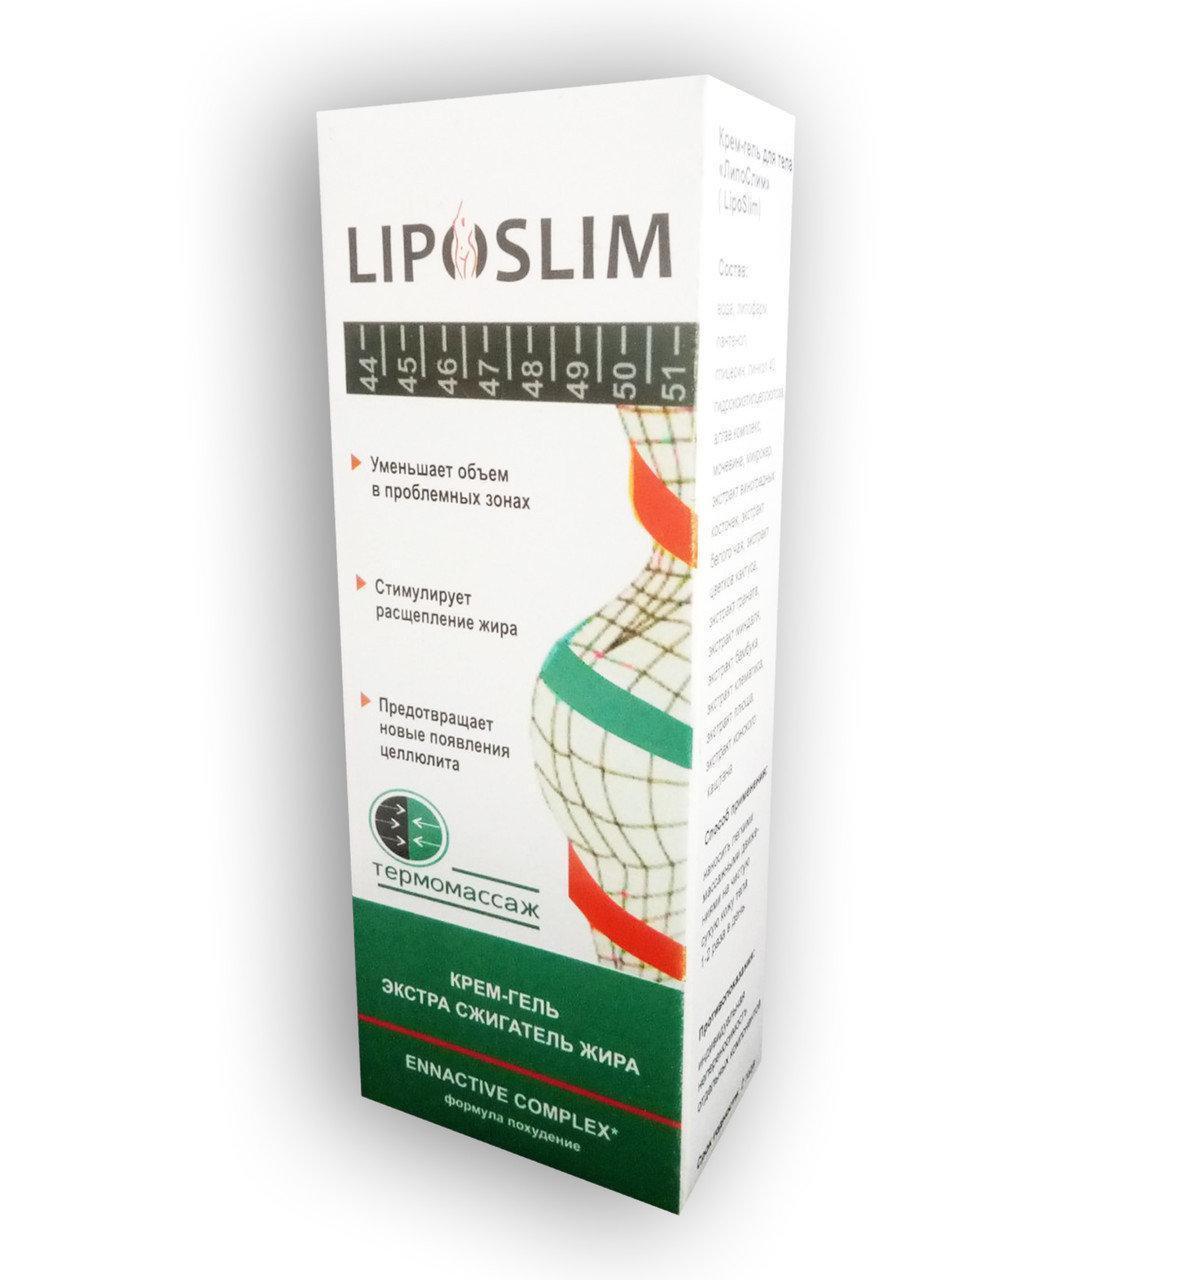 LipoSlim - Крем-гель жиросжигающий (ЛипоСлим) ViP